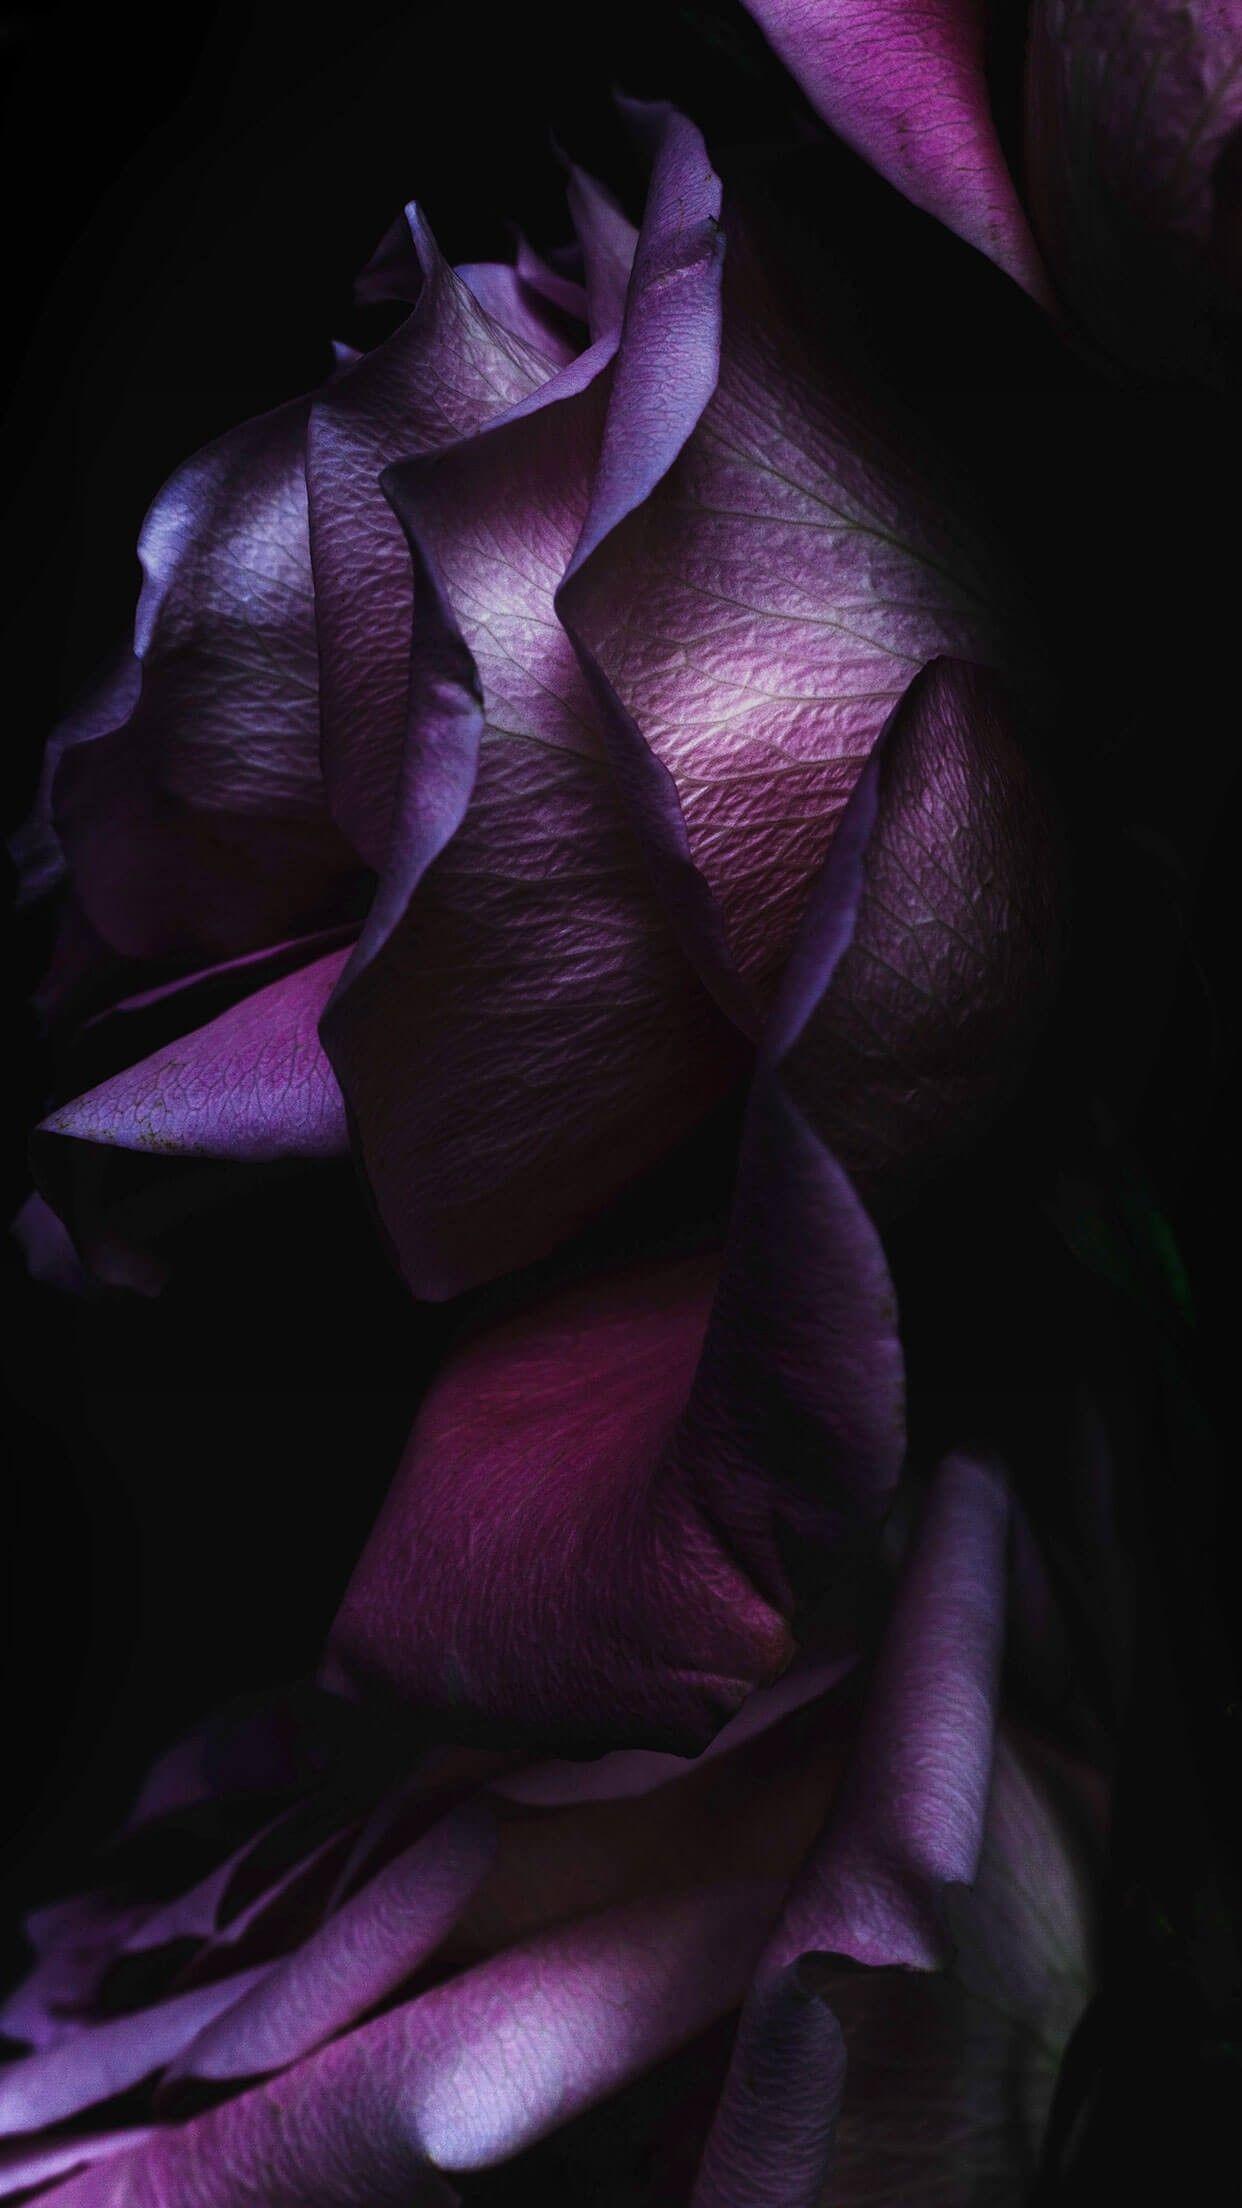 Pink and Black Rose Wallpaper (69+ images)